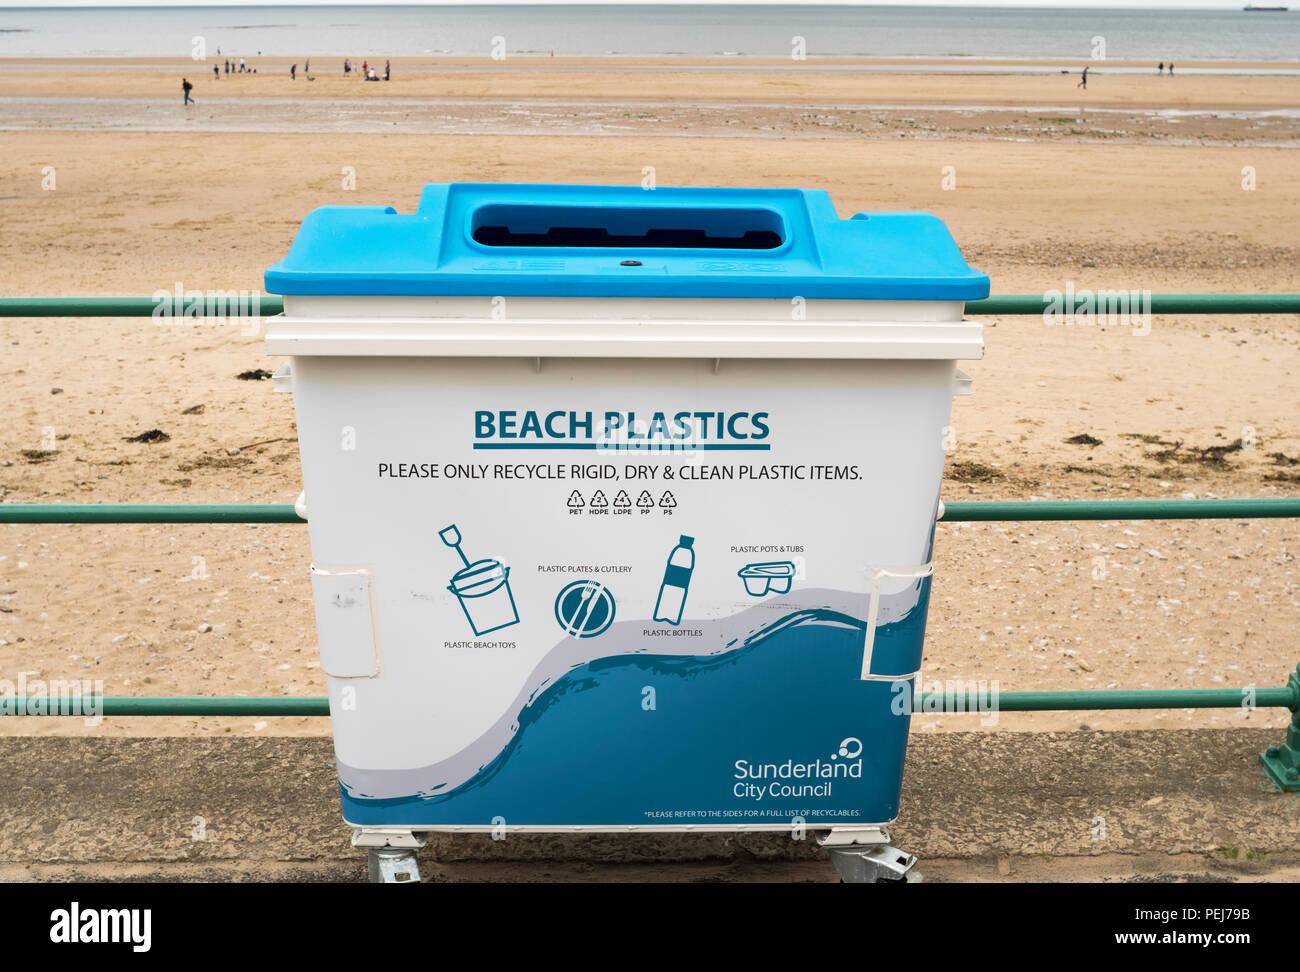 A beach plastics recycling bin, Seaburn, Sunderland, England, UK - Stock Image